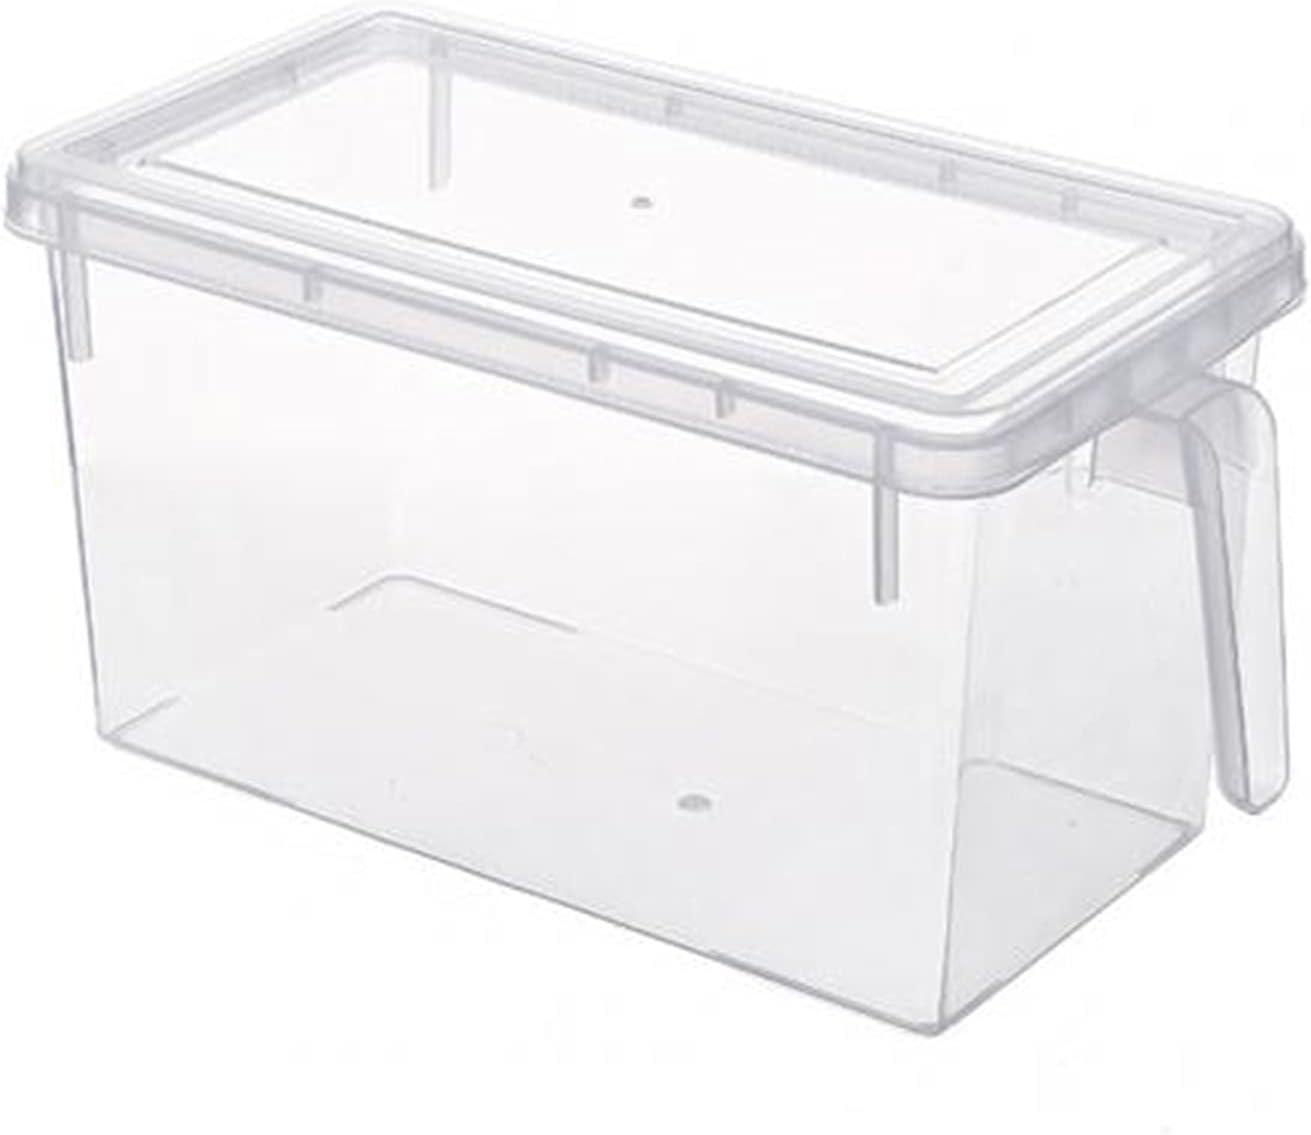 Plastic Keep Fresh Portable Refrigerator Fridge Sealed Food Fruits Storage Box Organizer Container Storage Box Food Container 602 (Color : White)